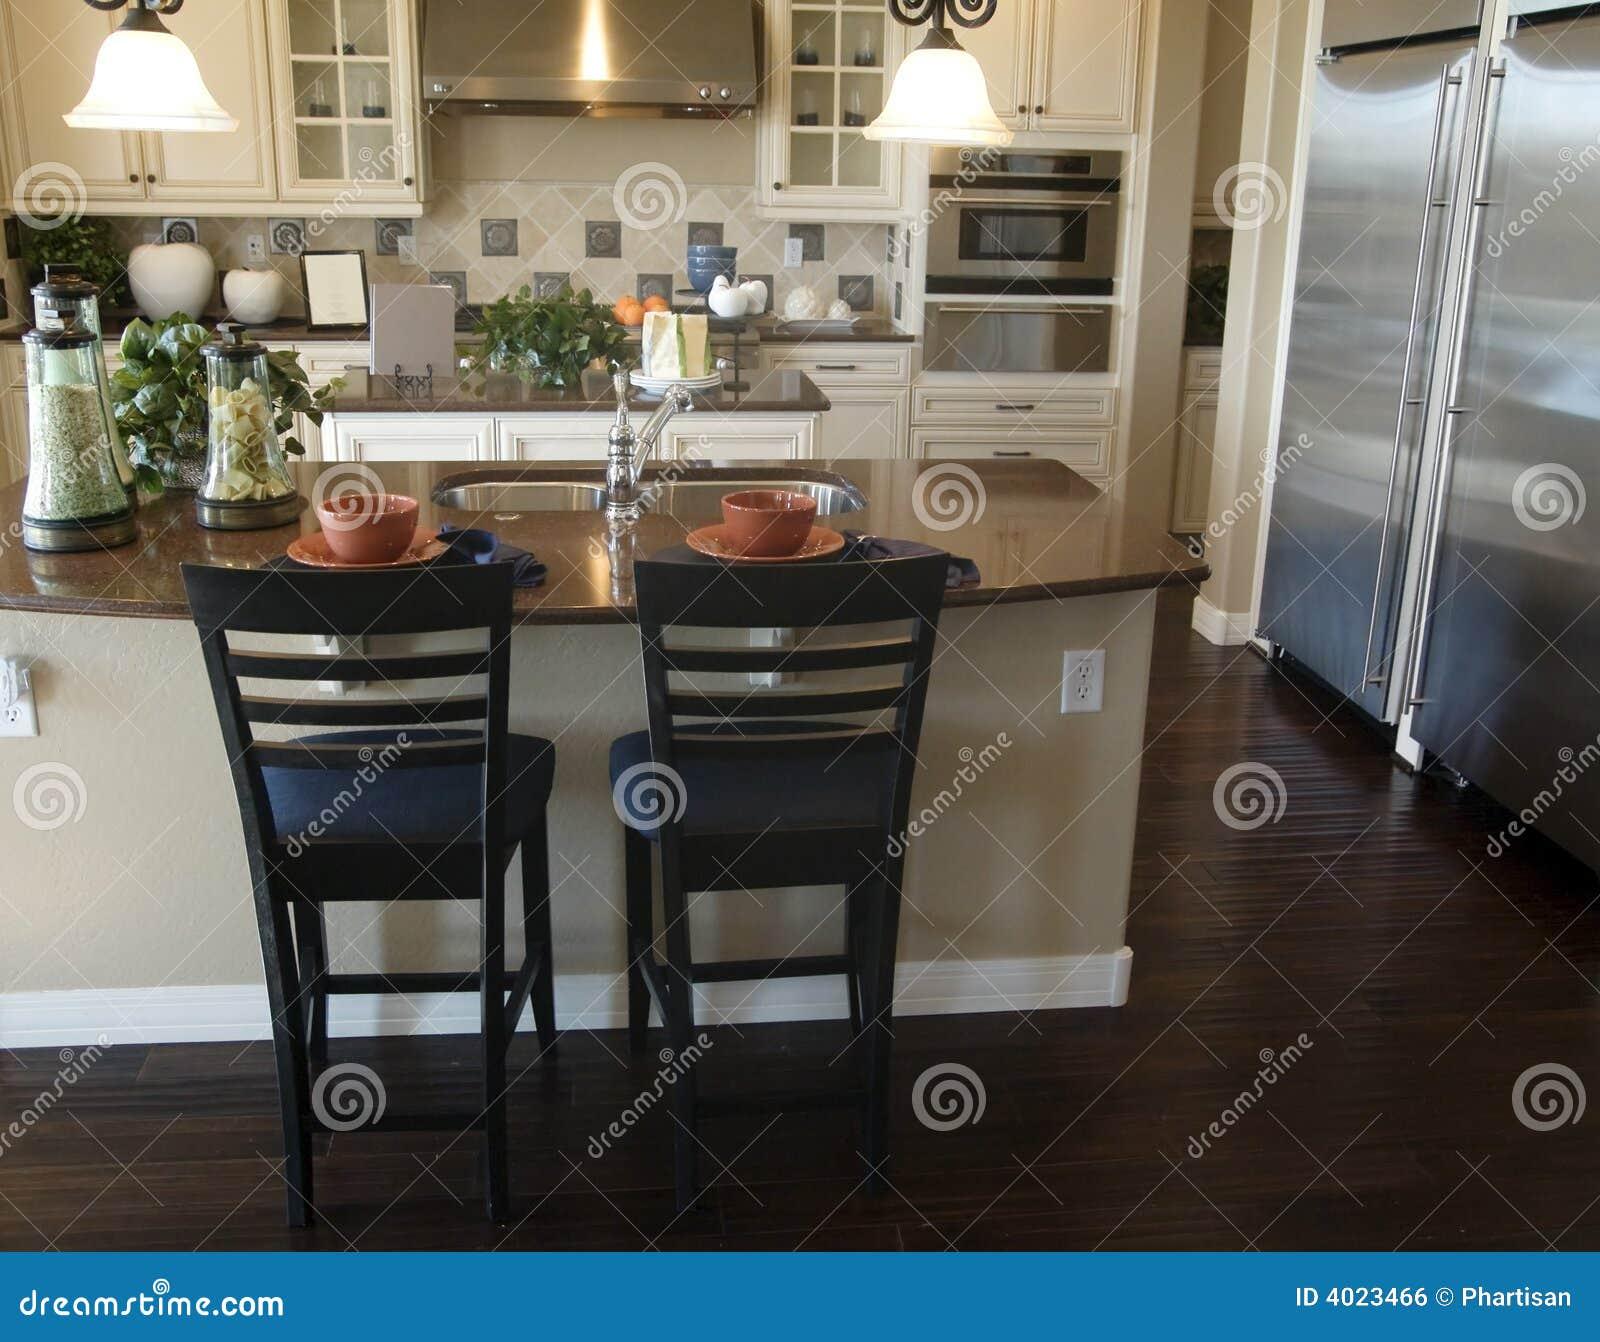 Dise o interior de la cocina moderna foto de archivo for Interior cocinas modernas